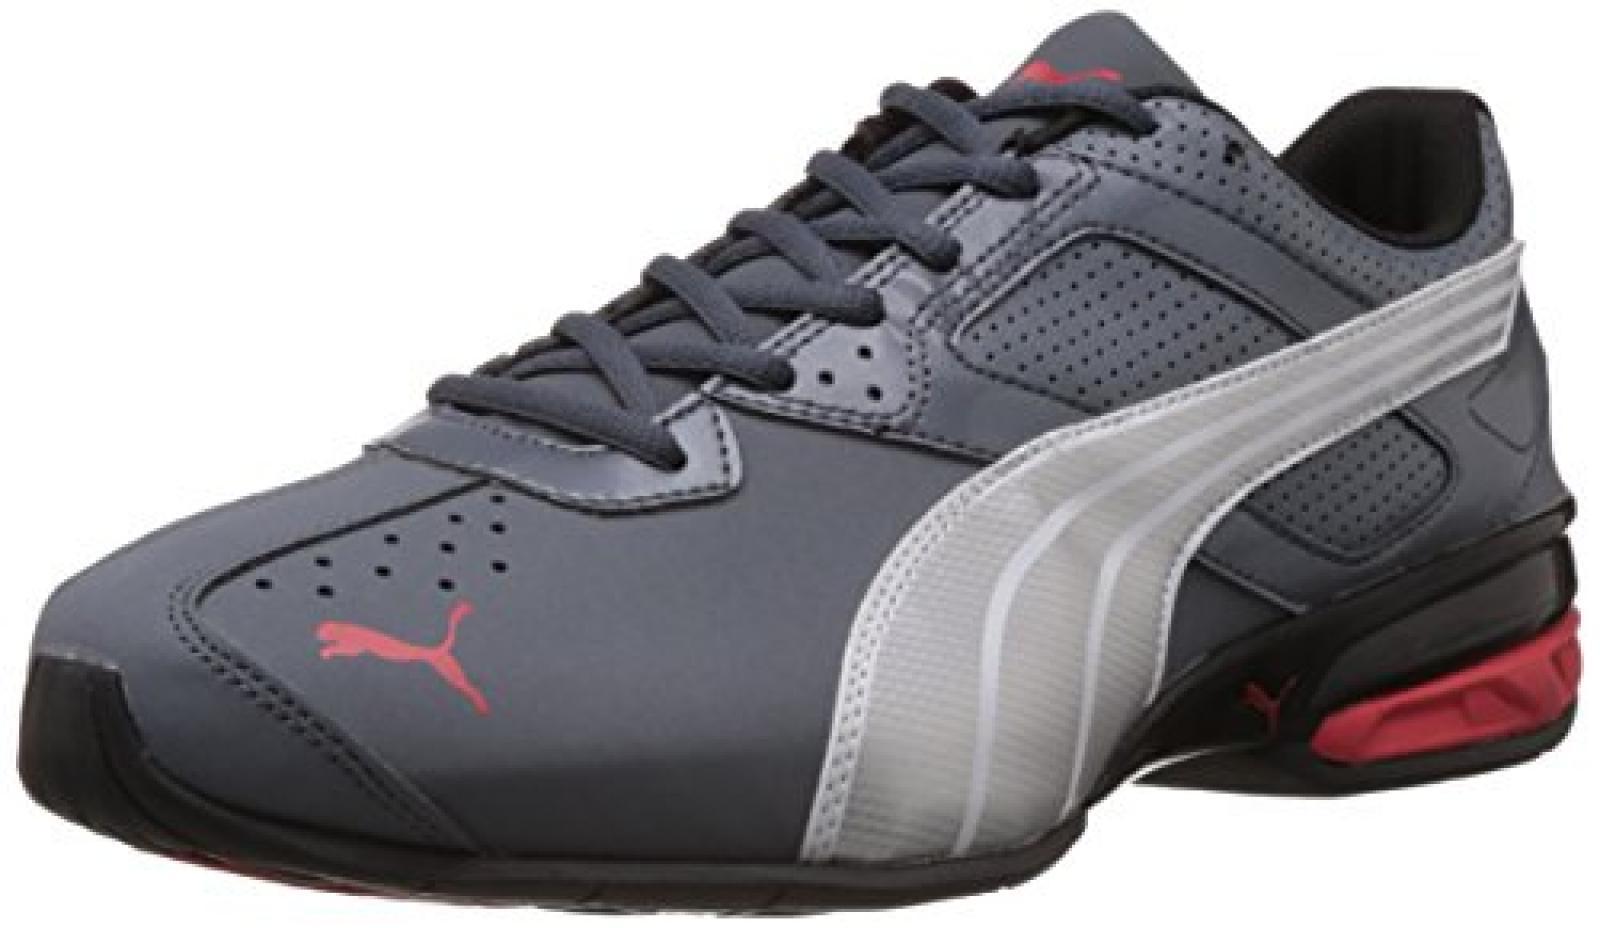 Puma Tazon 5 NM Herren Sneakers